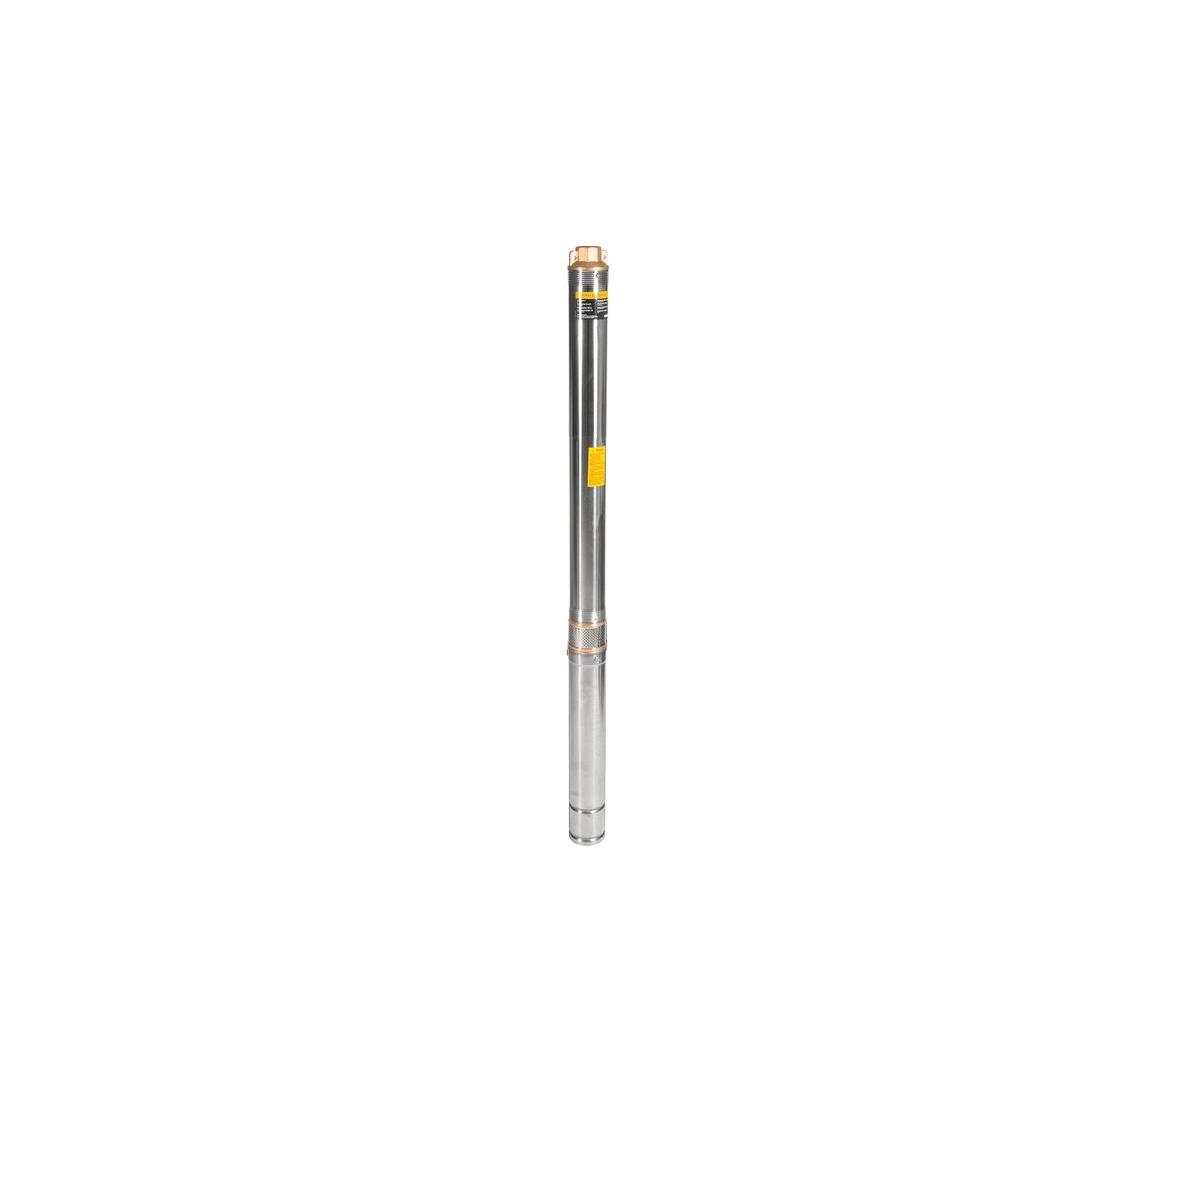 "Bomba submersa de 3"" tipo caneta 1hp 220V VONDER"